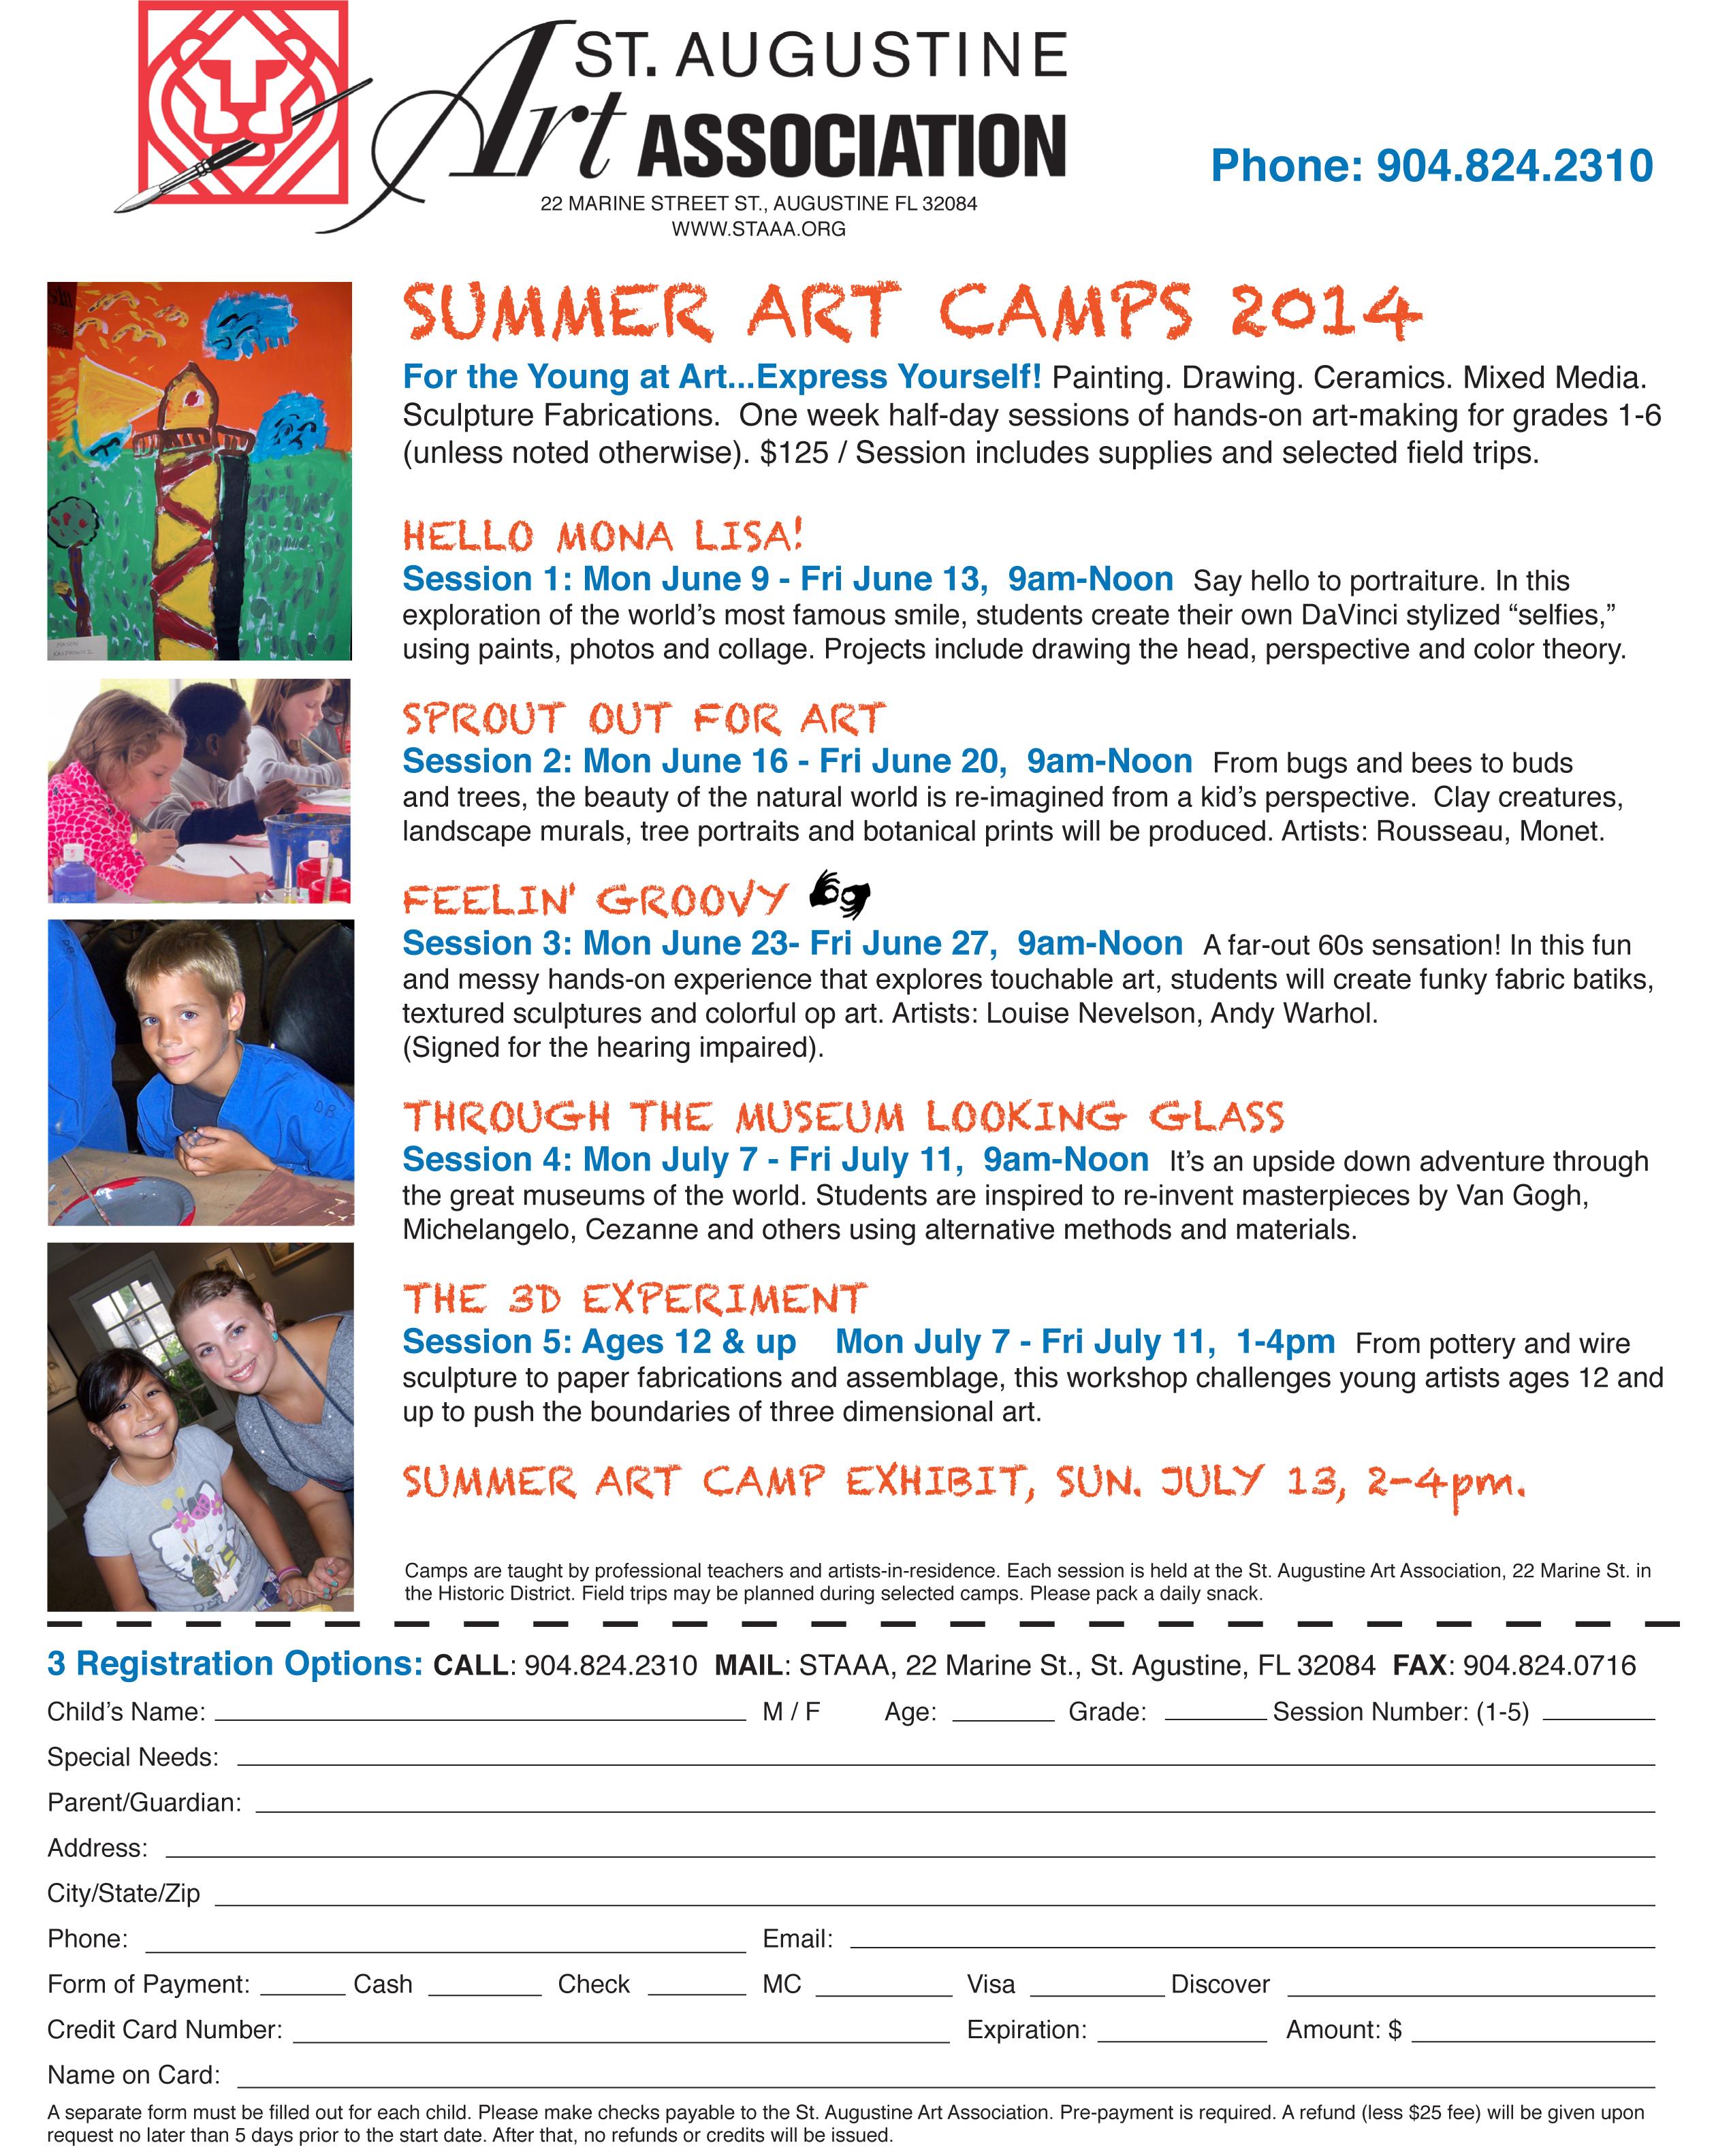 1 art camp